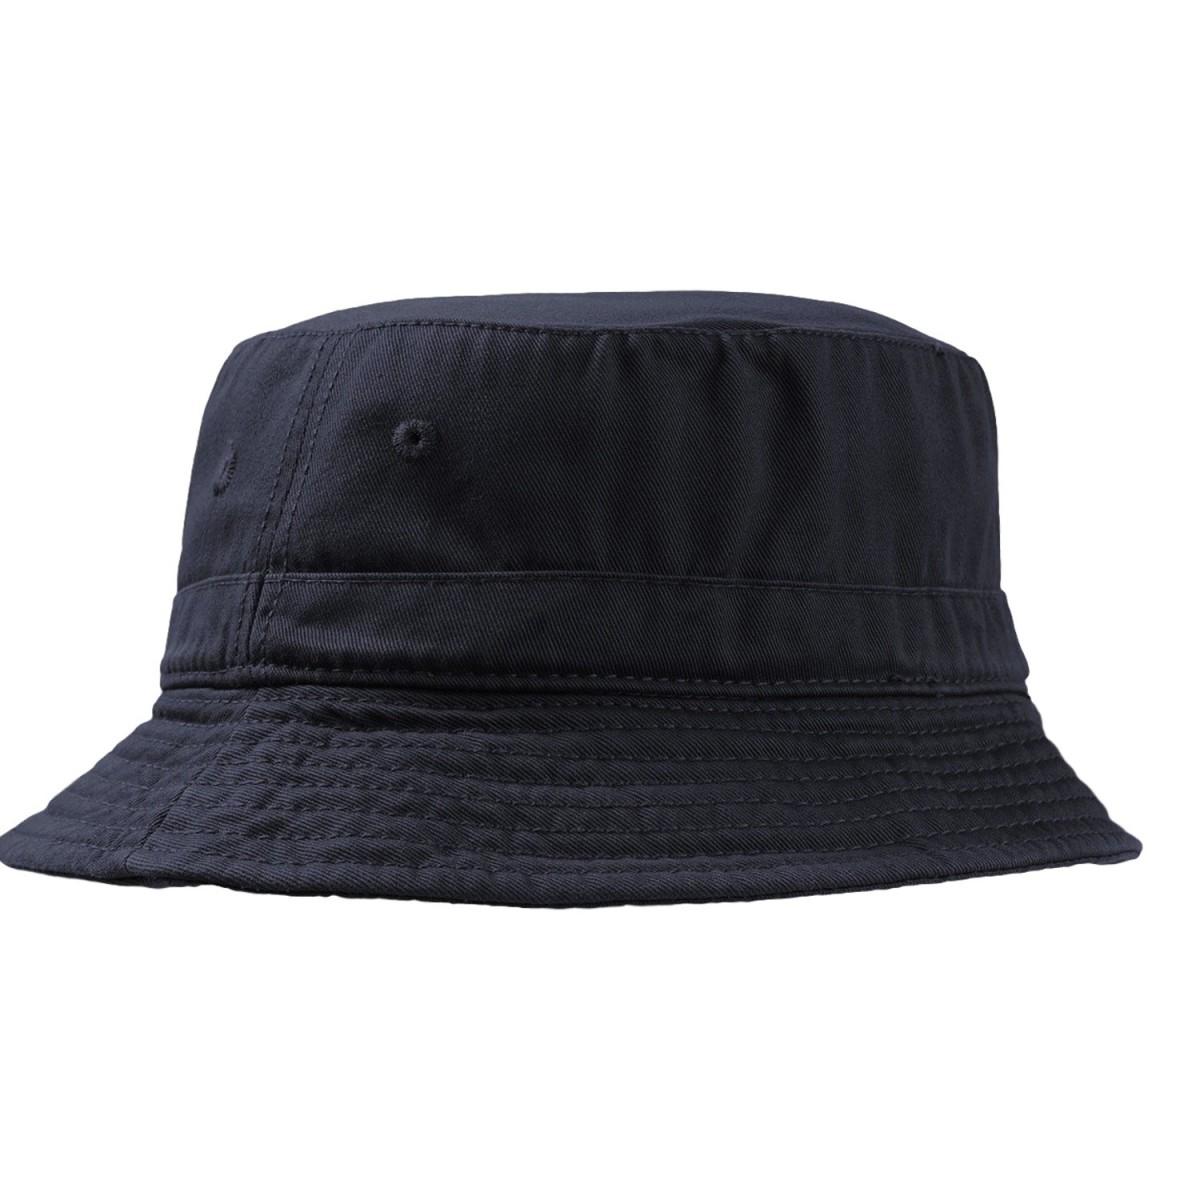 https://www.boutique-augustin.com/1623-thickbox/fisherman-s-hat-.jpg